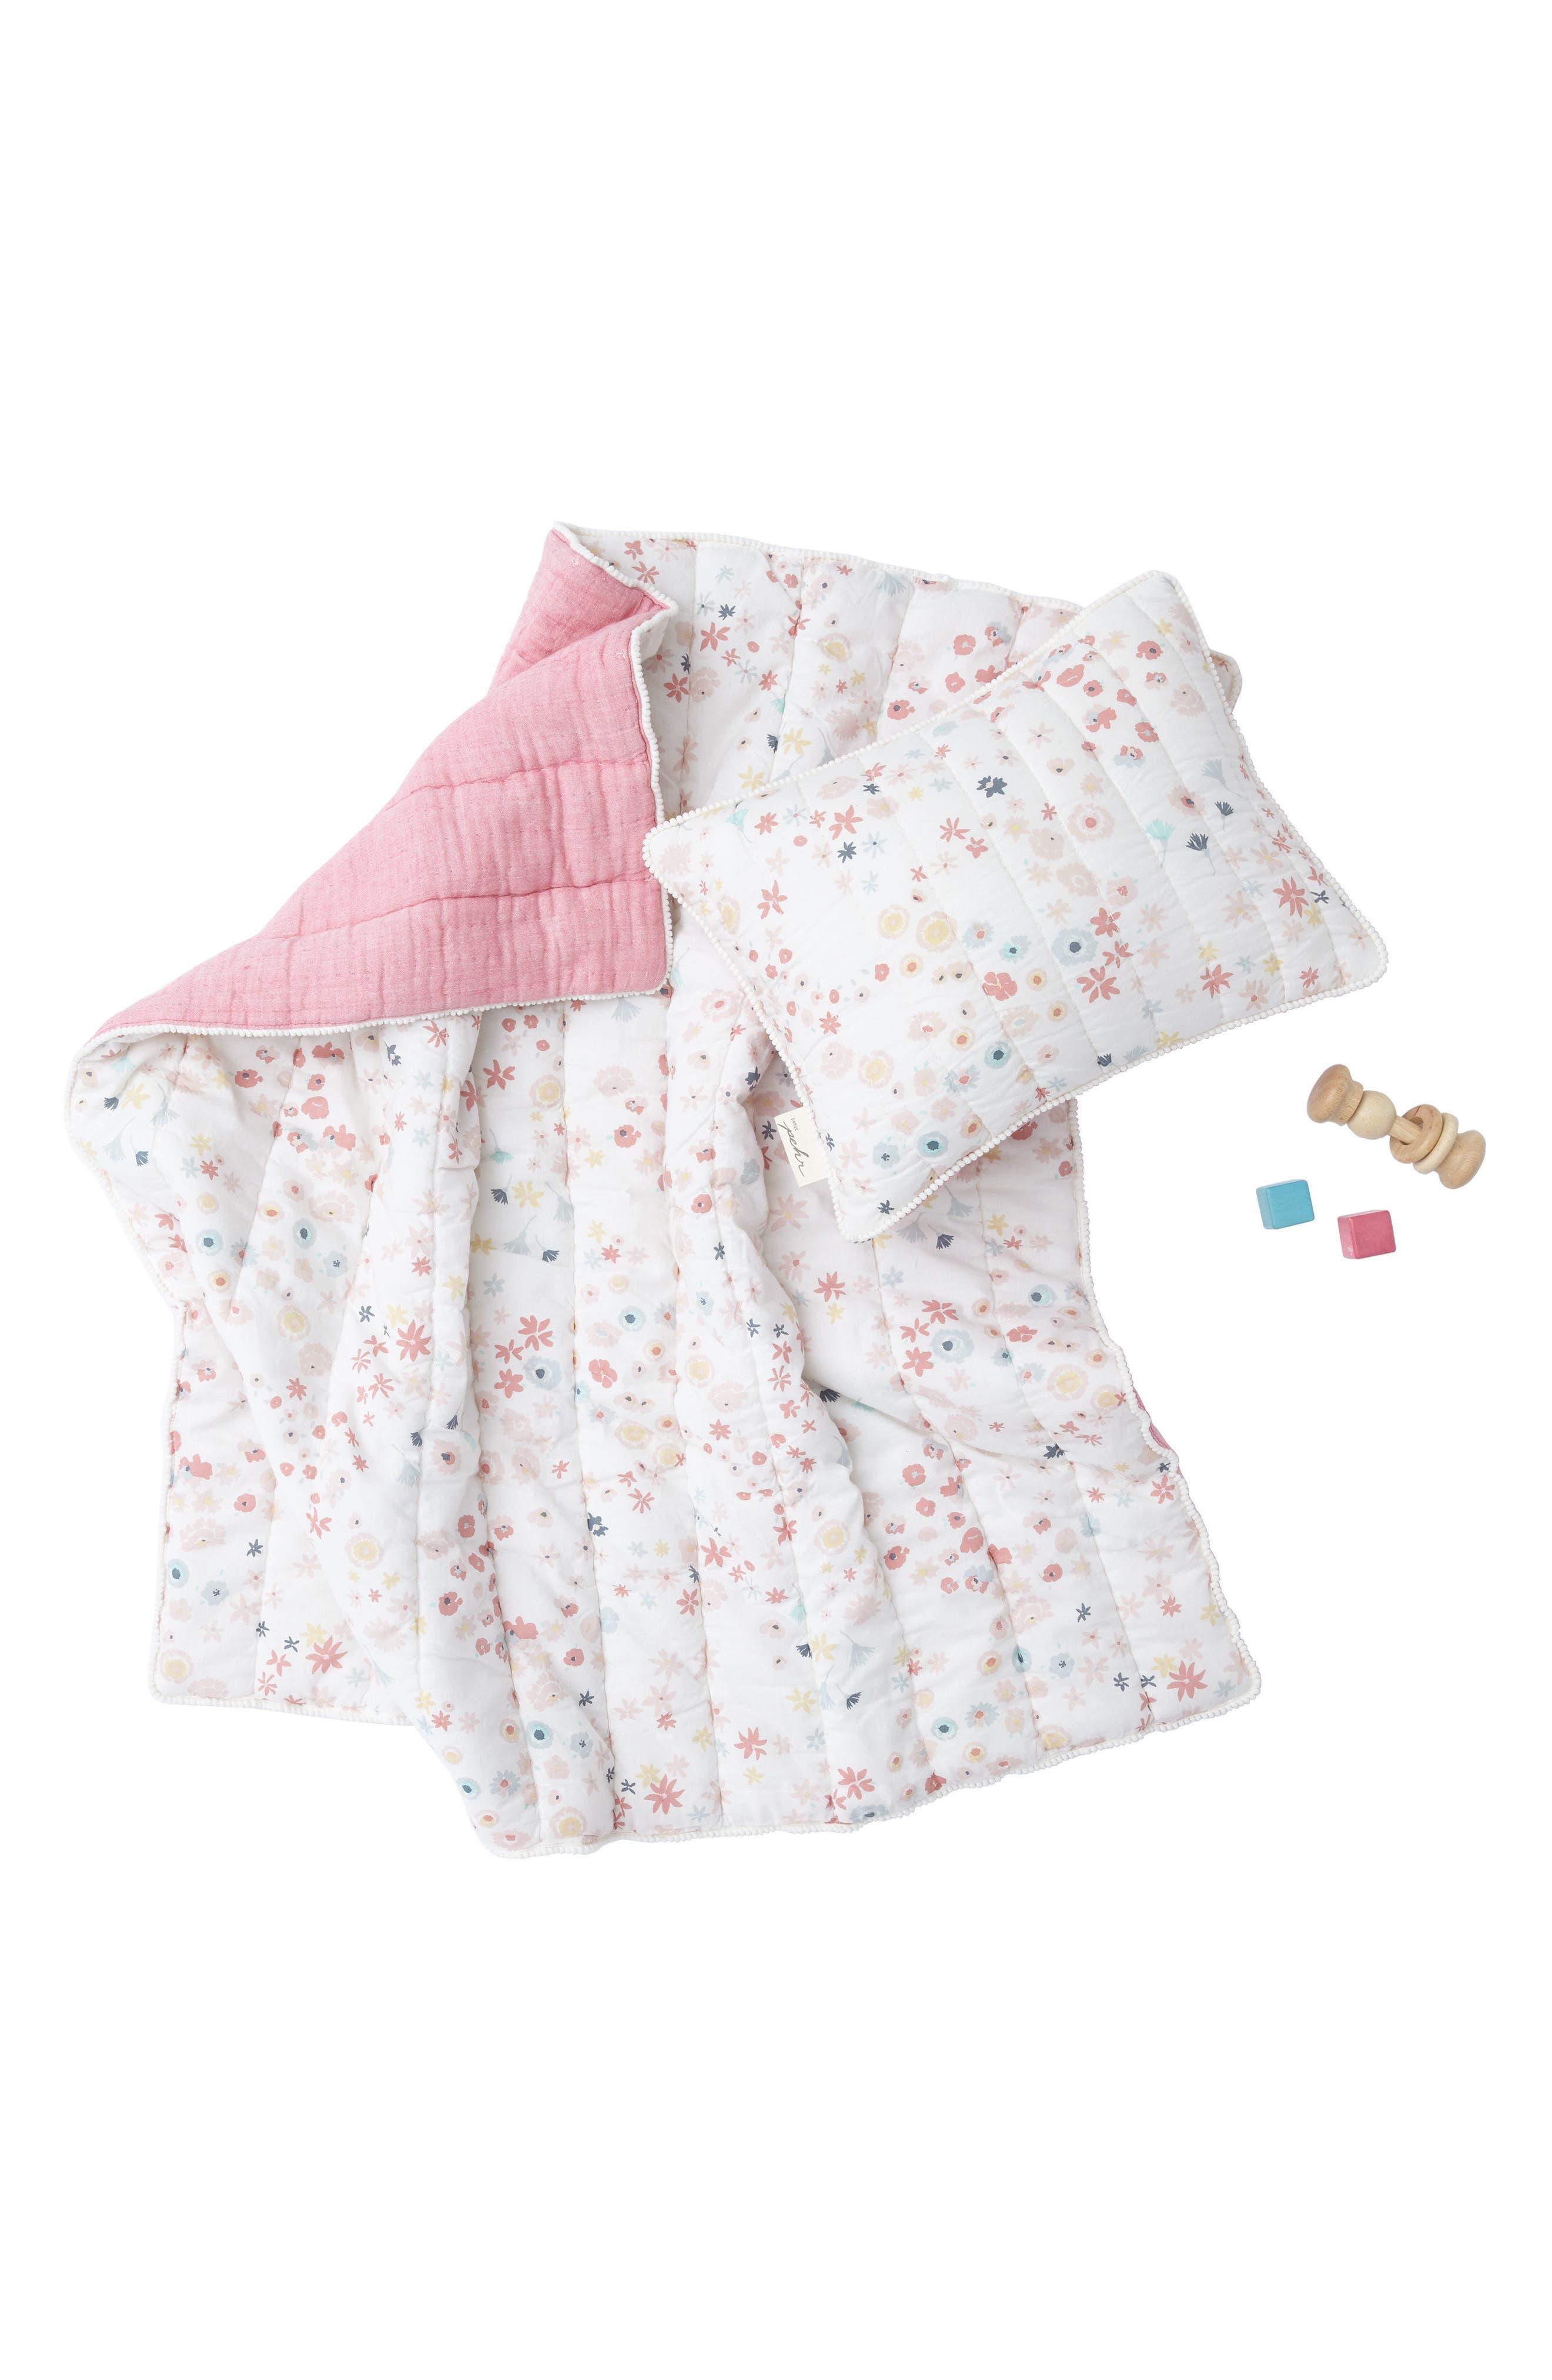 Showers Crib Sheet, Swaddle, Blanket & Pillow Set,                             Alternate thumbnail 2, color,                             PINK